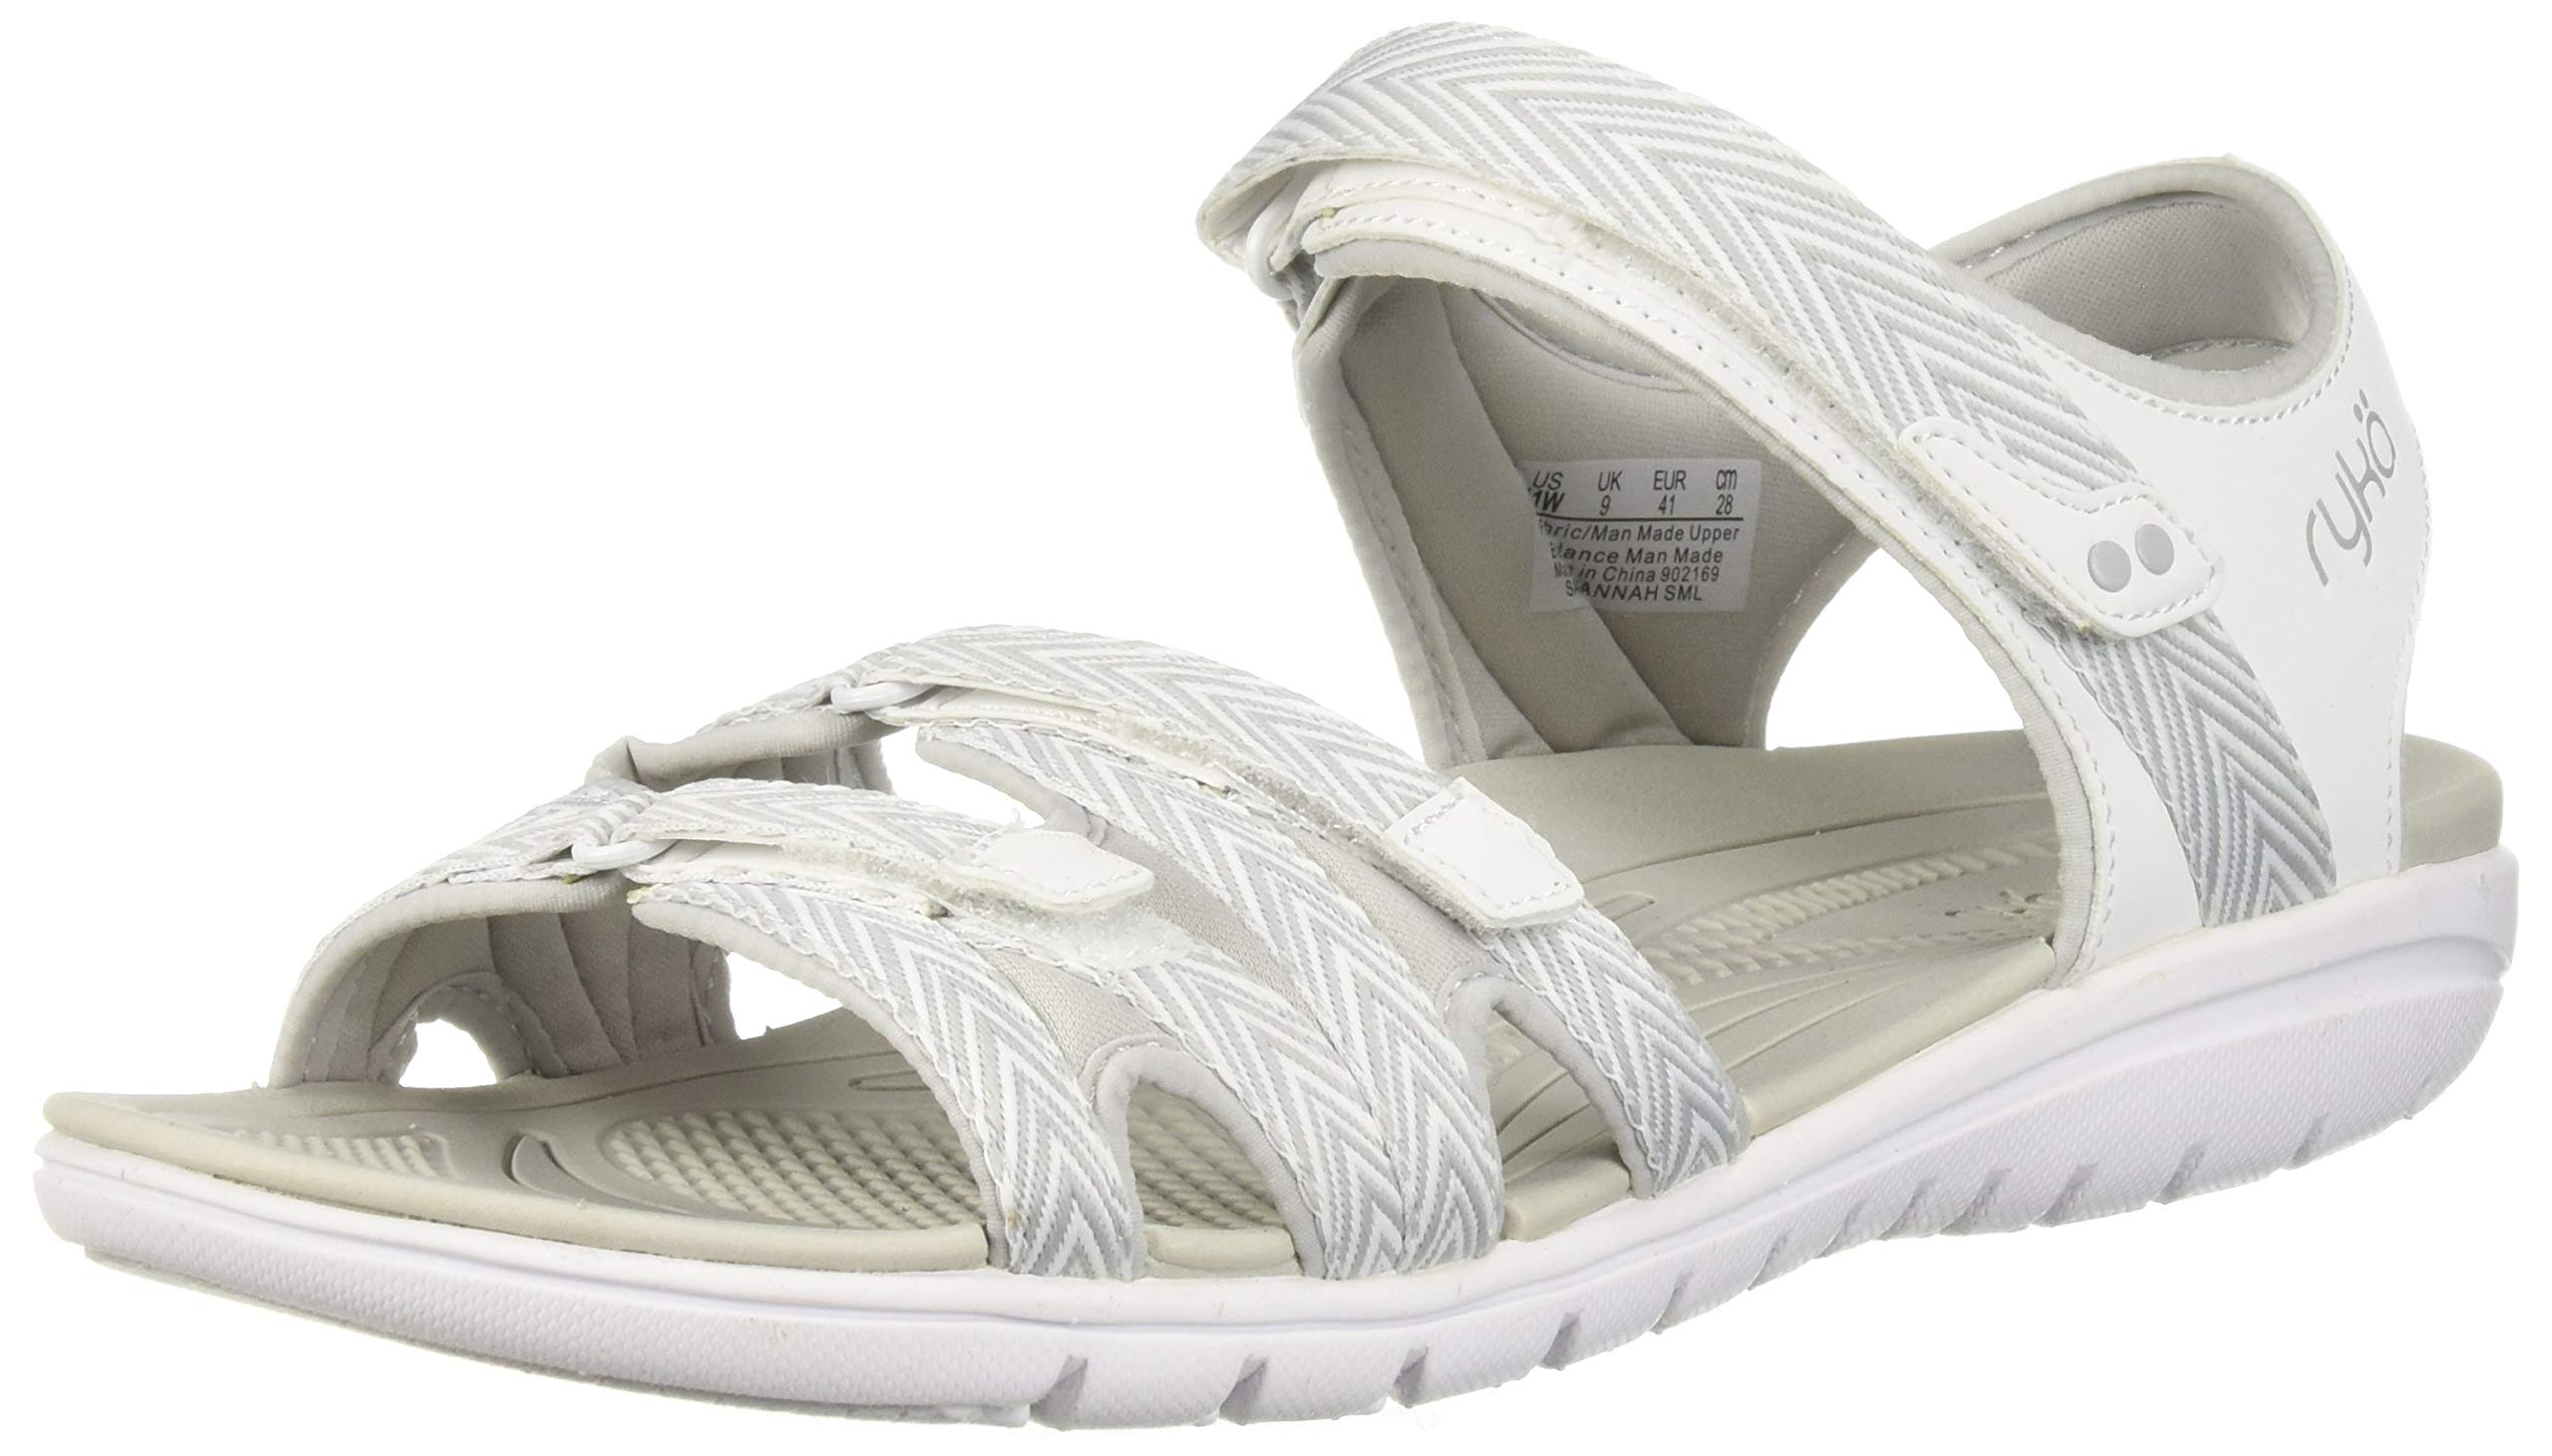 Ryka Women's Savannah Sandal, White/Grey, 5 W US